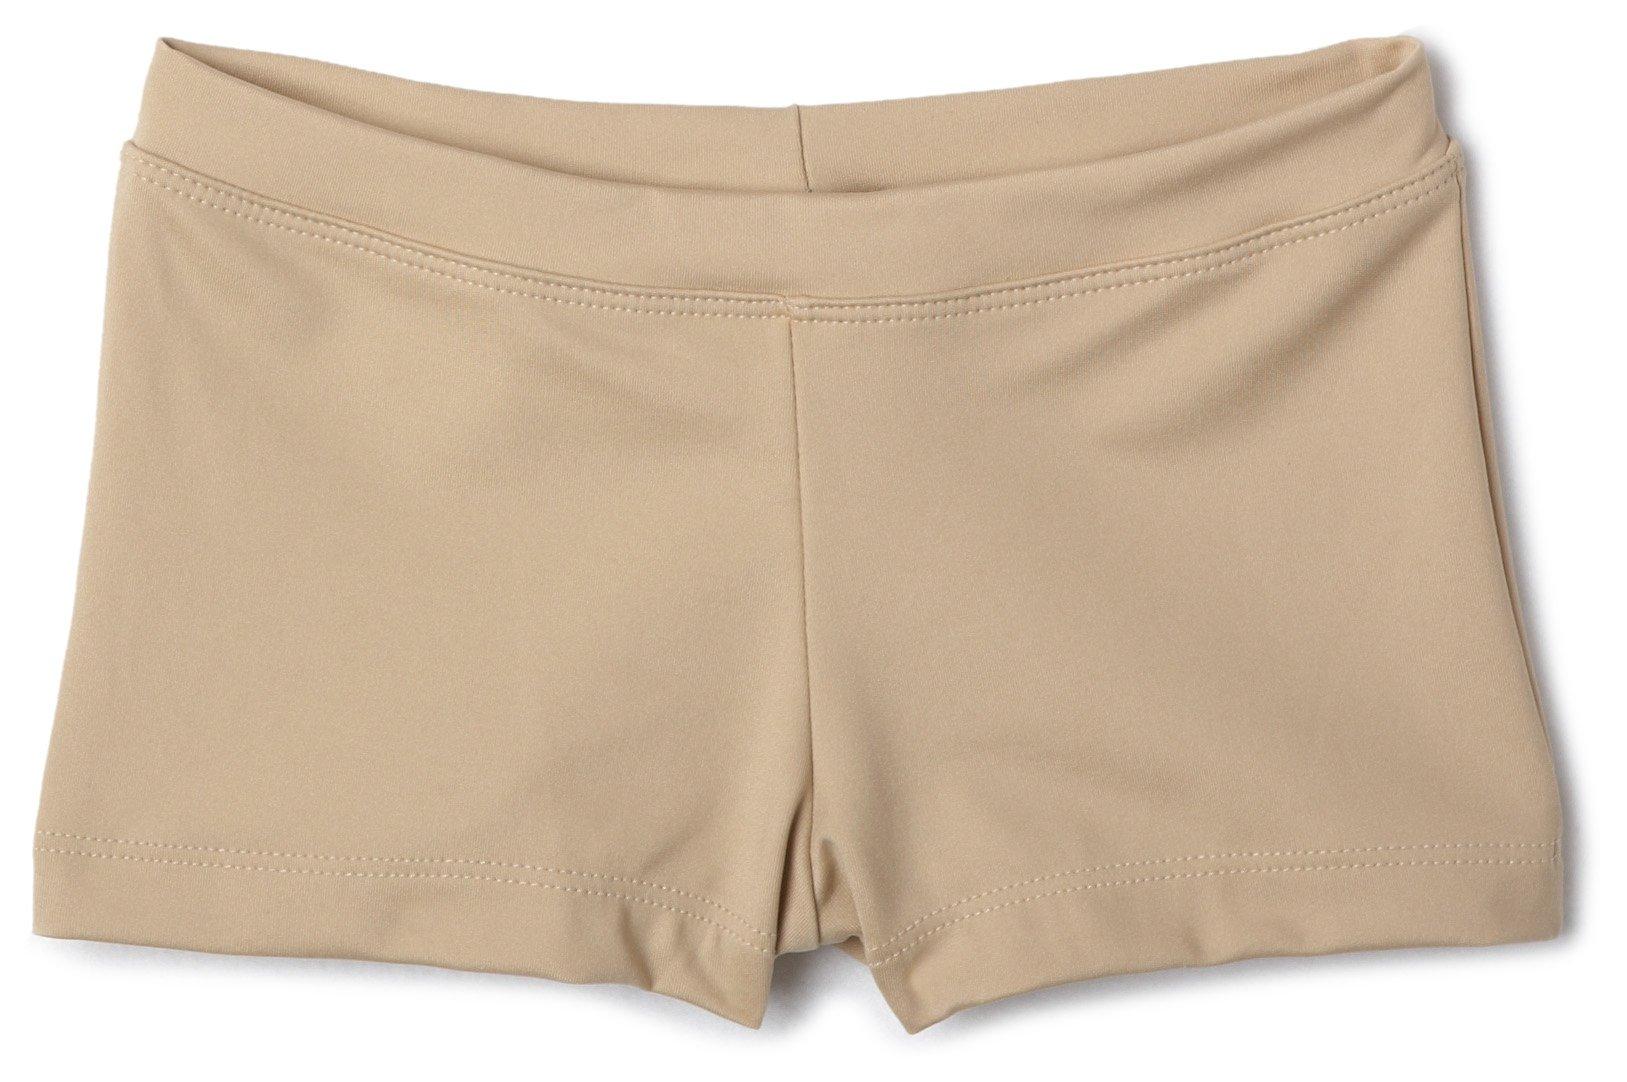 Capezio Big Girls' Boy Cut Low Rise Short,Nude,L (12-14)